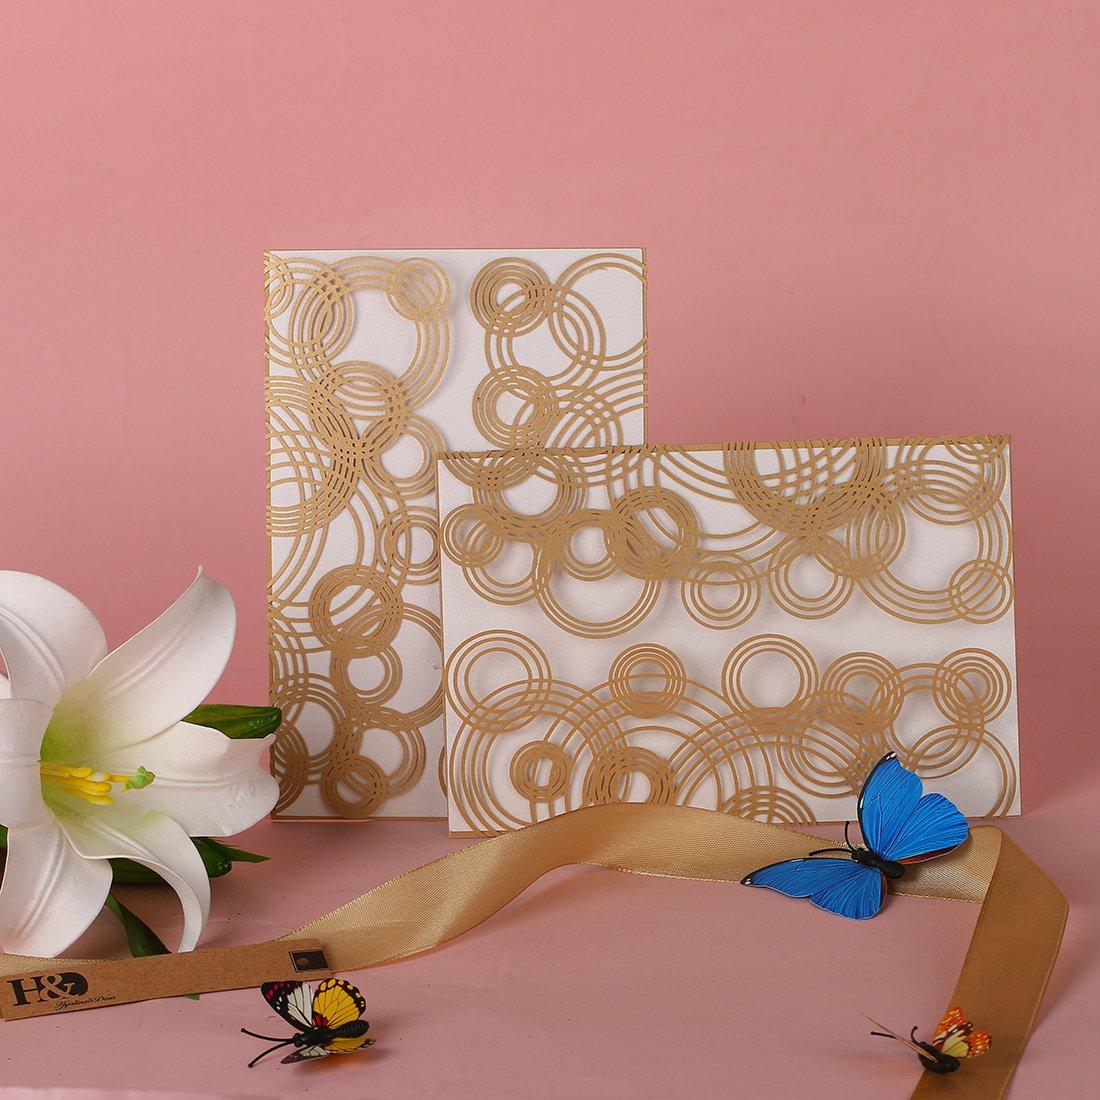 HONGJORA 60pcs White Laser Cut Wedding Invitations Cards Kit for Marriage Engagement Birthday Bridal Shower